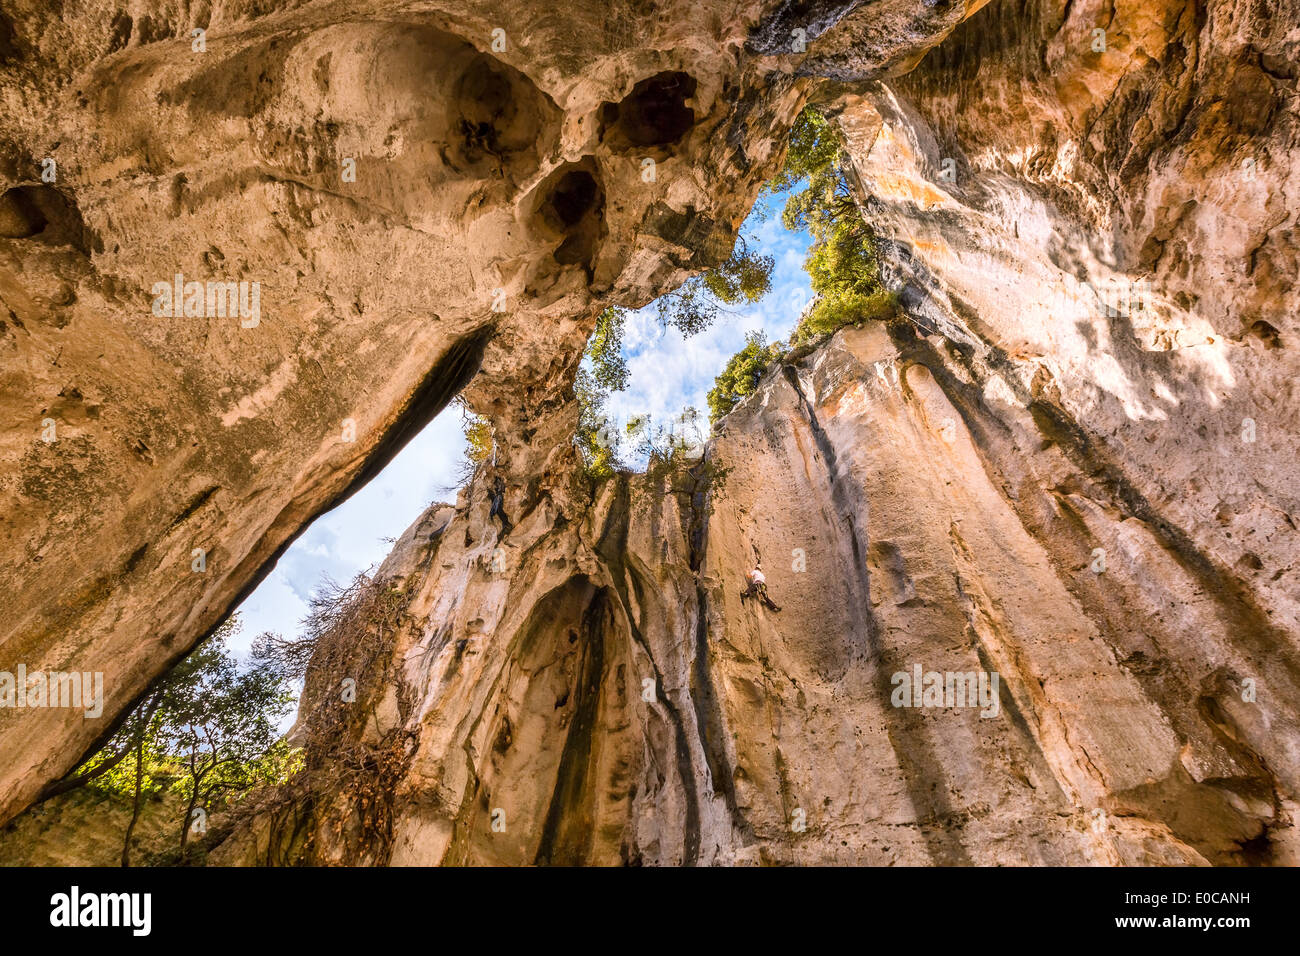 Rock climbing in a cave, Finale Ligure, Italy, EU - Stock Image